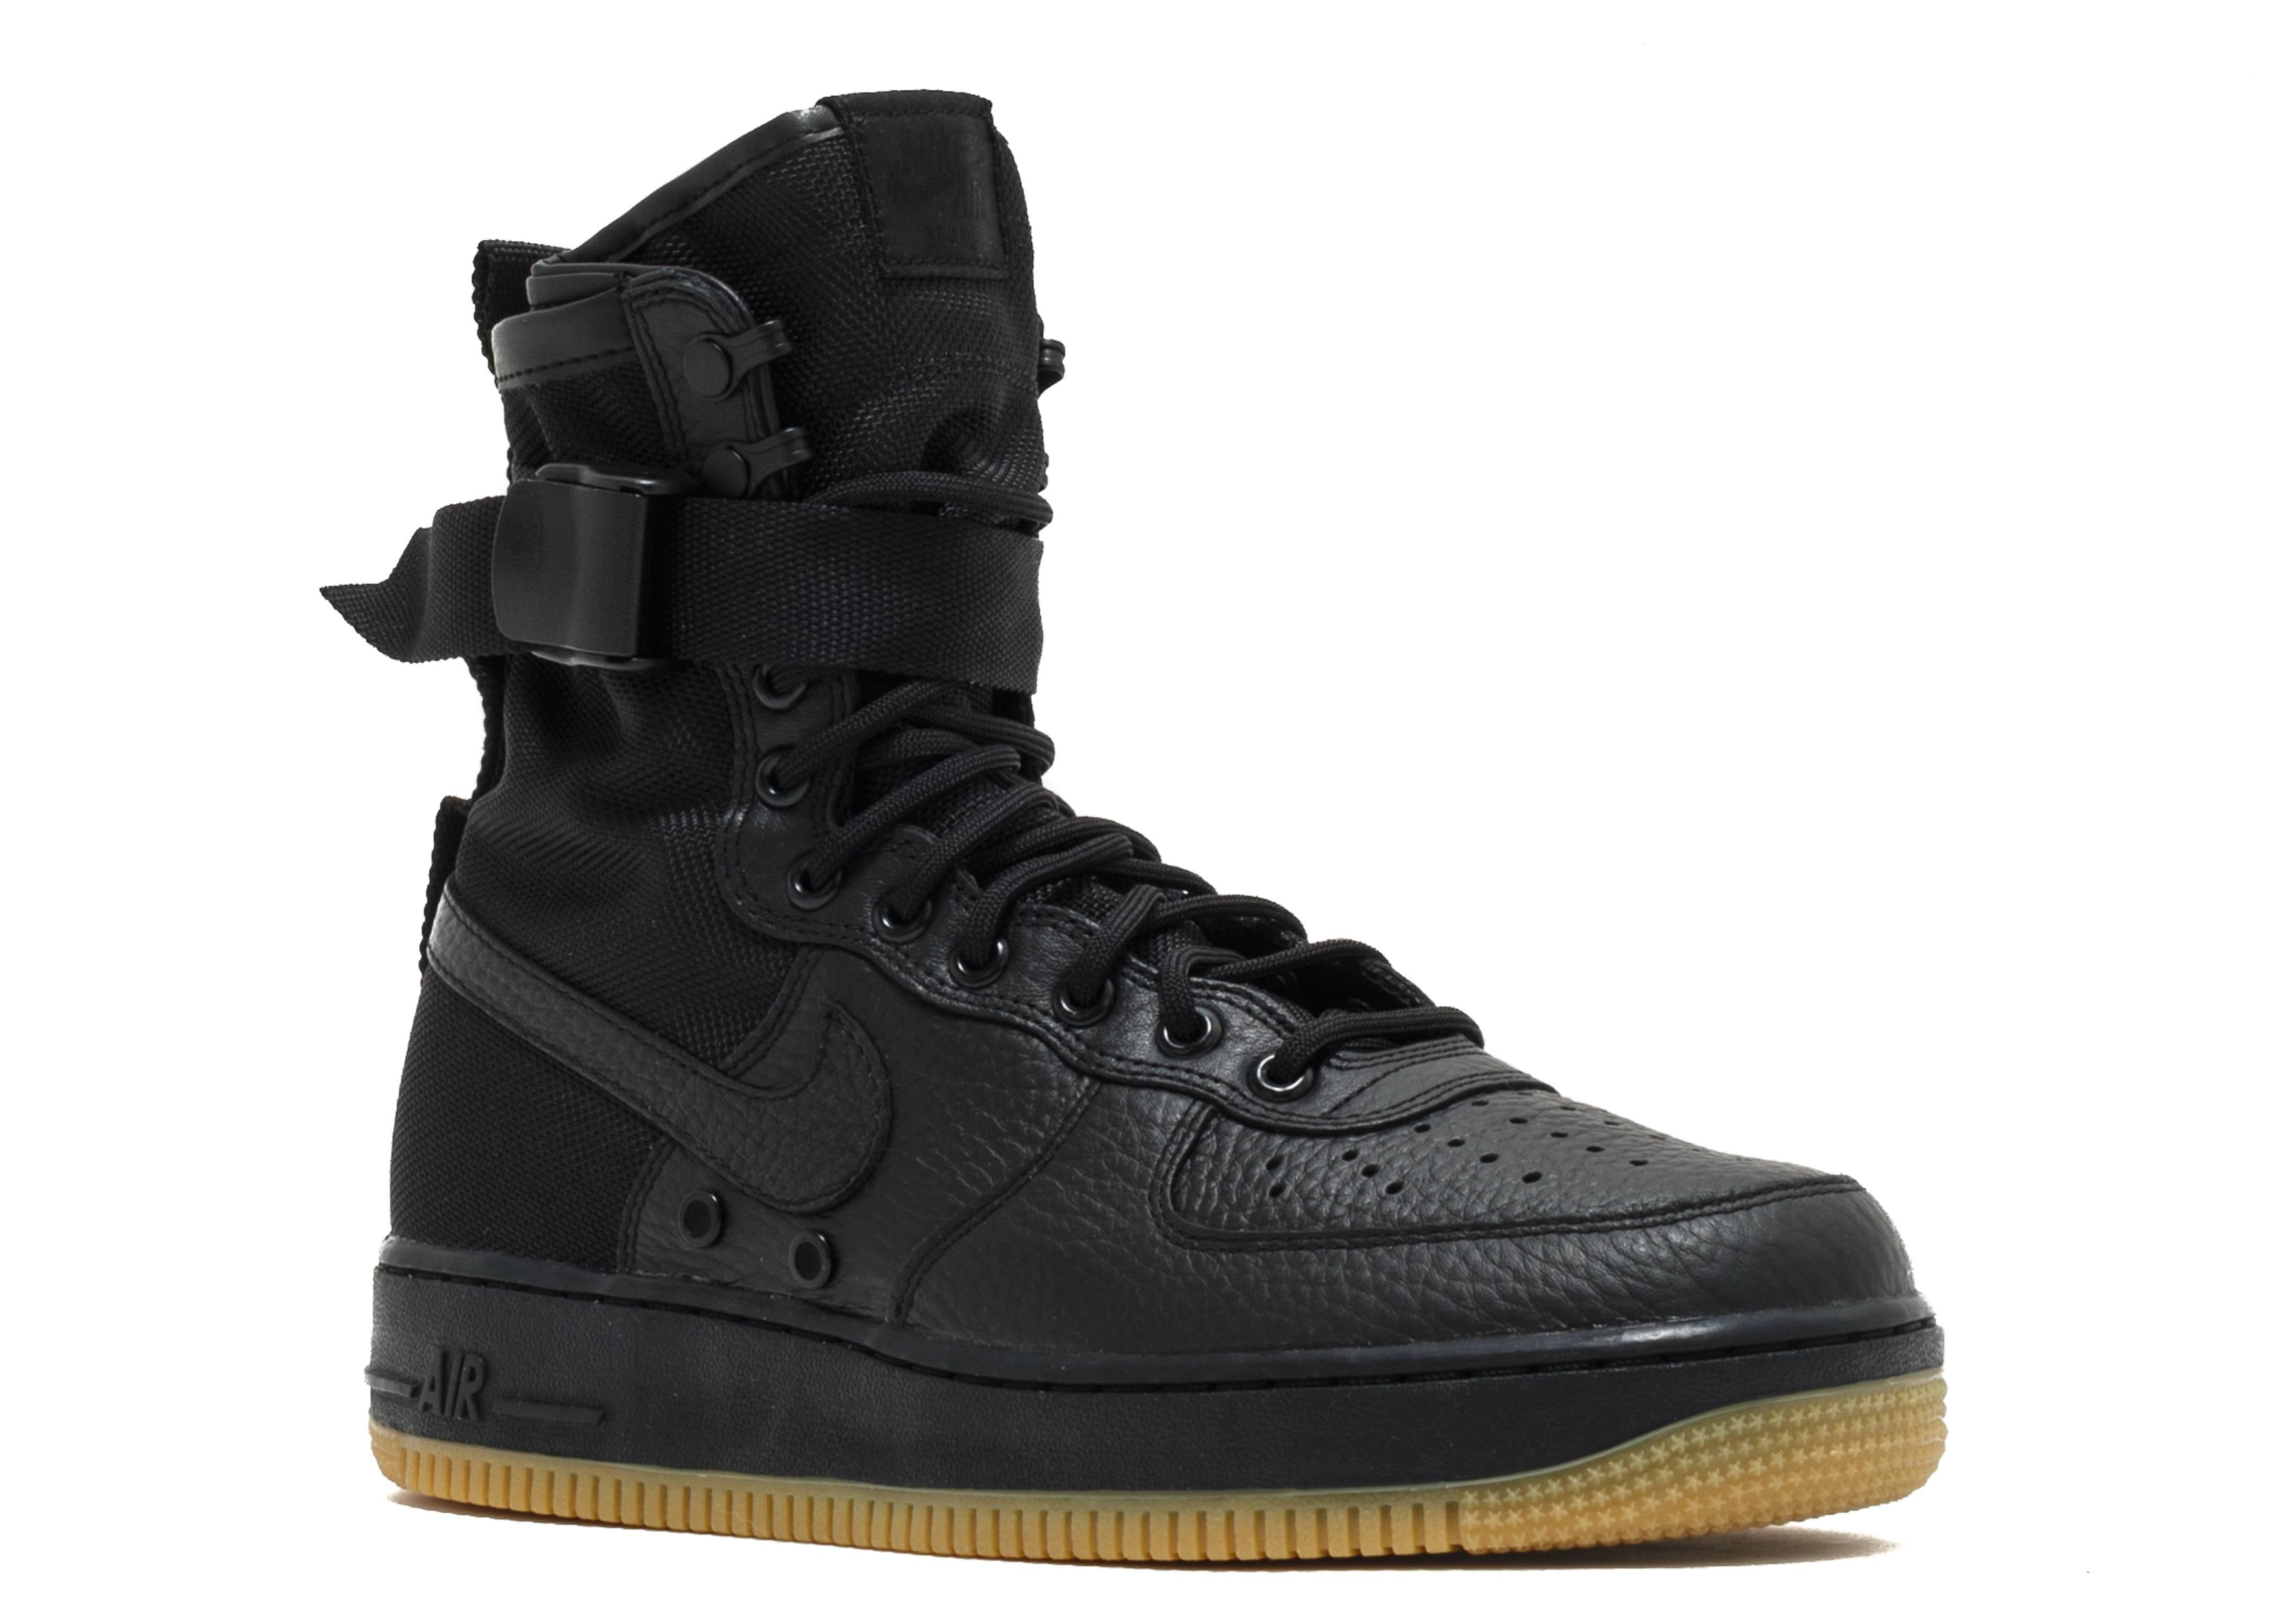 Sf Af1 Quotspecial Fieldquot Nike 864024 001 Black Black Black Black Flight Club